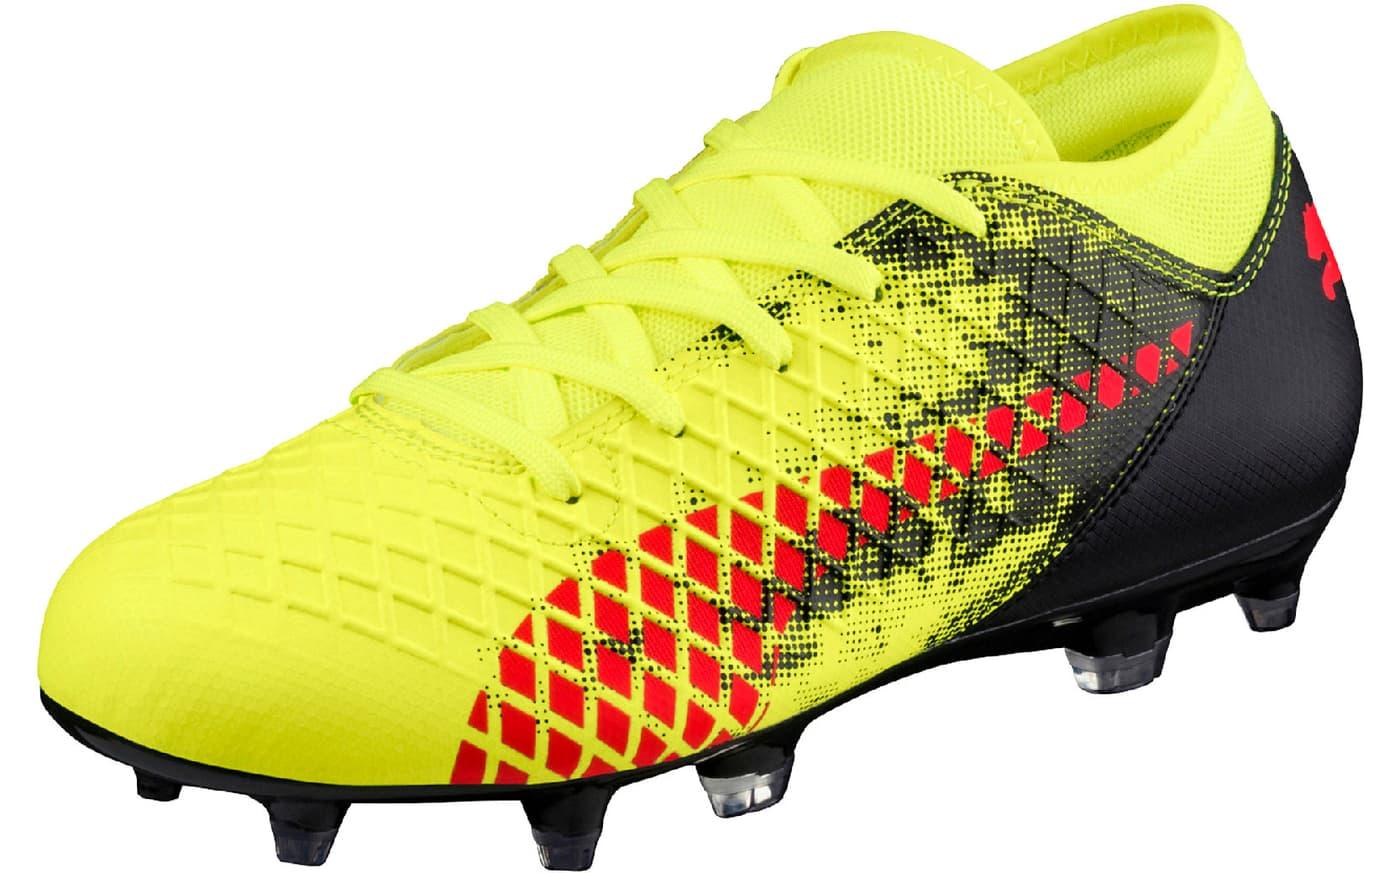 4a30714833e5d Fgag Future 18 Chaussures 4 Migros Pour Puma Enfant De Football dStWBq